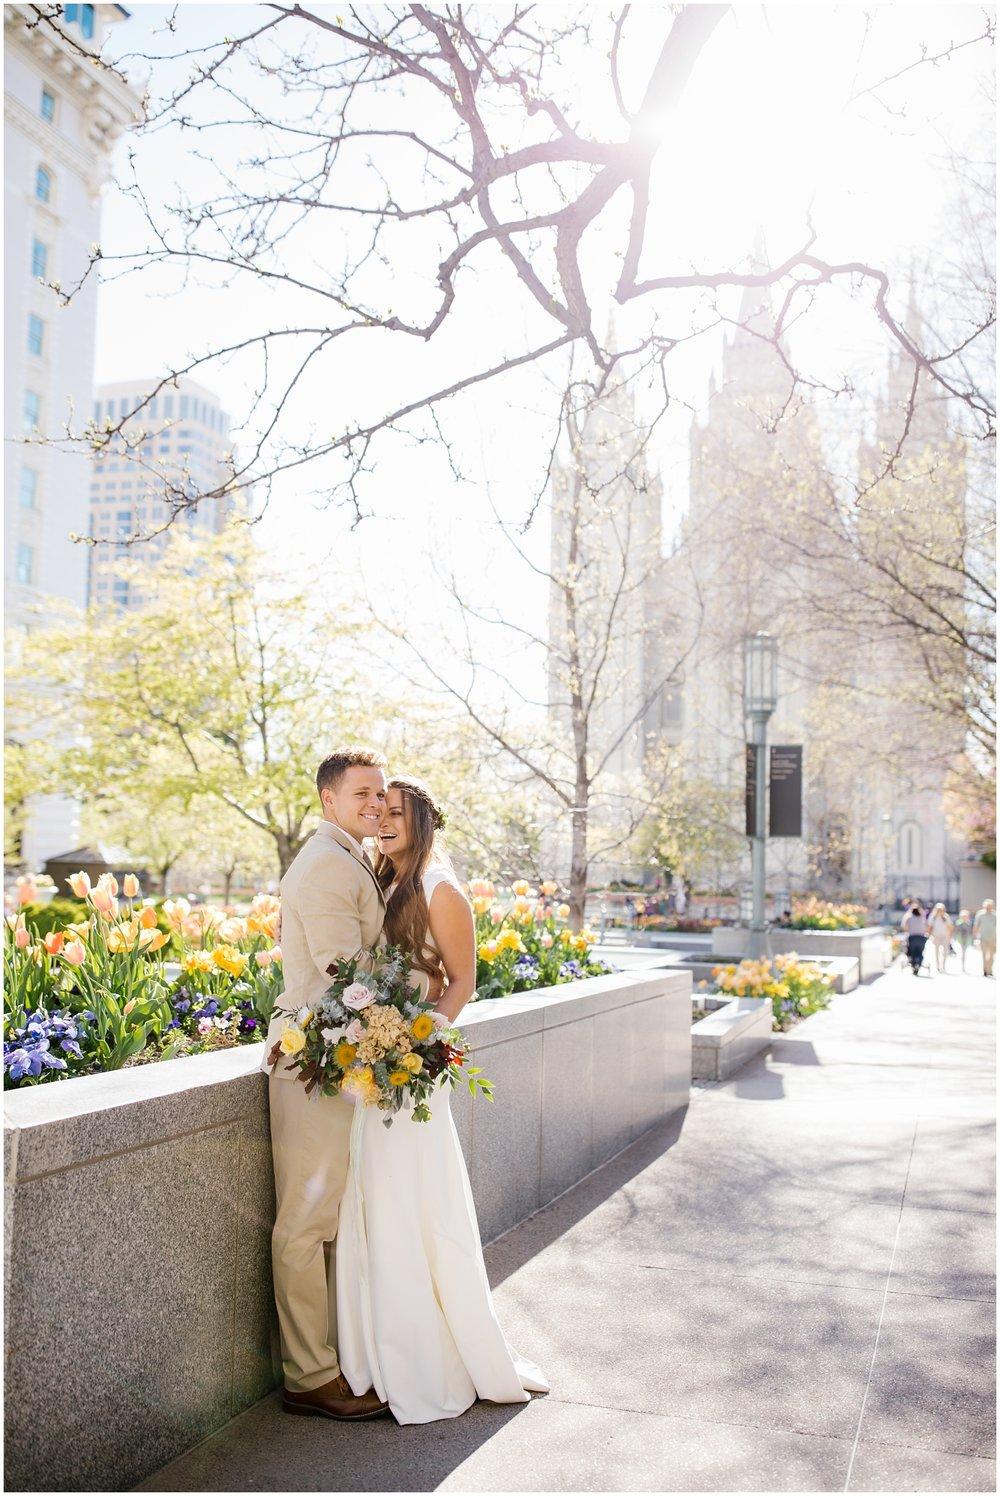 JC-Wedding-235_Lizzie-B-Imagery-Utah-Wedding-Photographer-Park-City-Salt-Lake-City-Temple-Joseph-Smith-Memorial-Building-Empire-Room.jpg